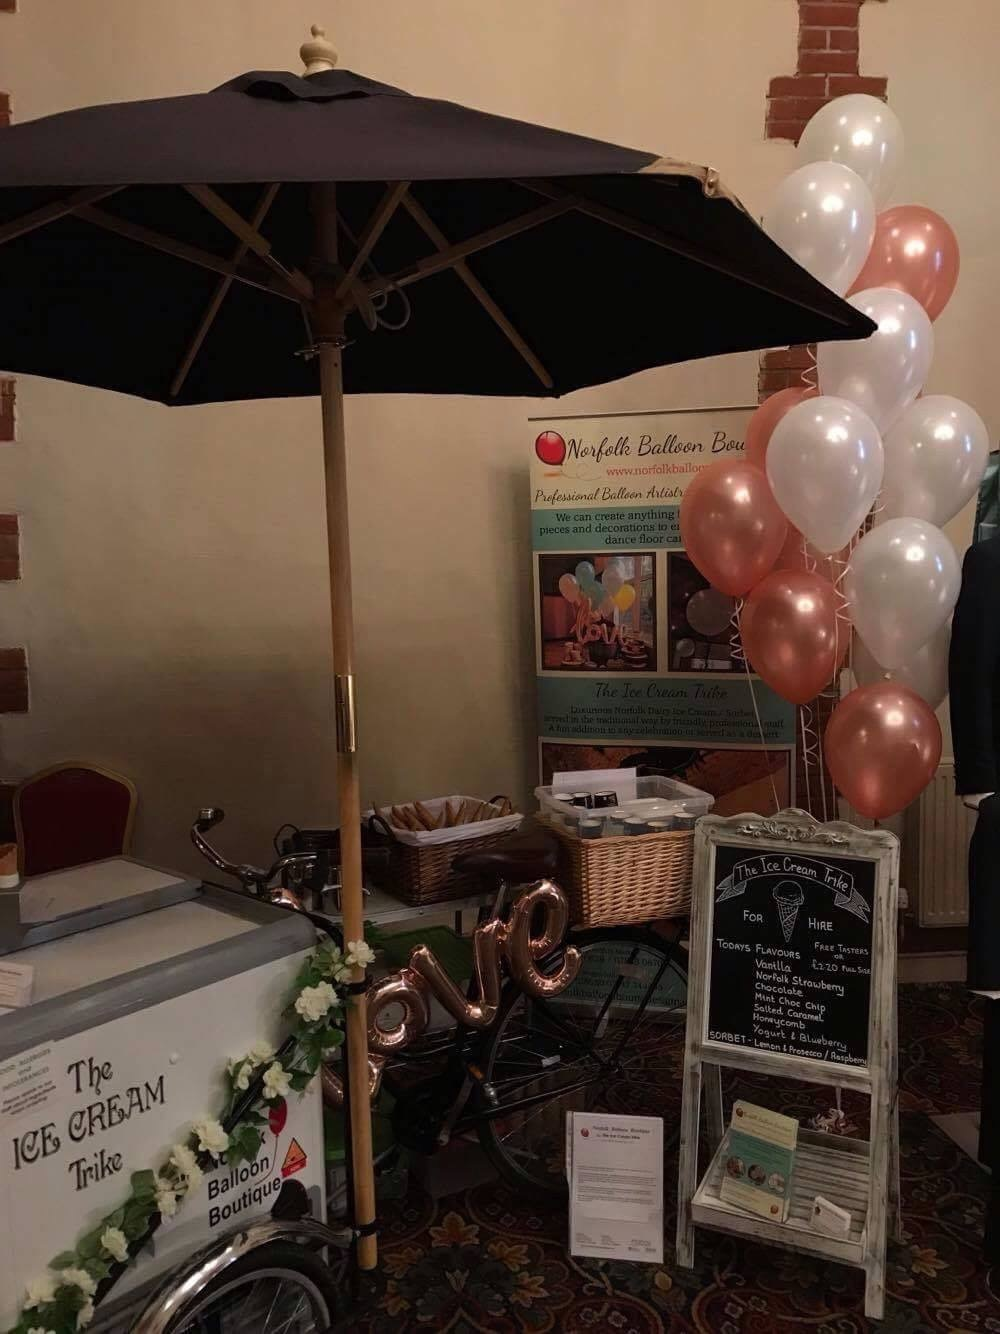 EDP wedding show - knight hill hotel & spa 2017